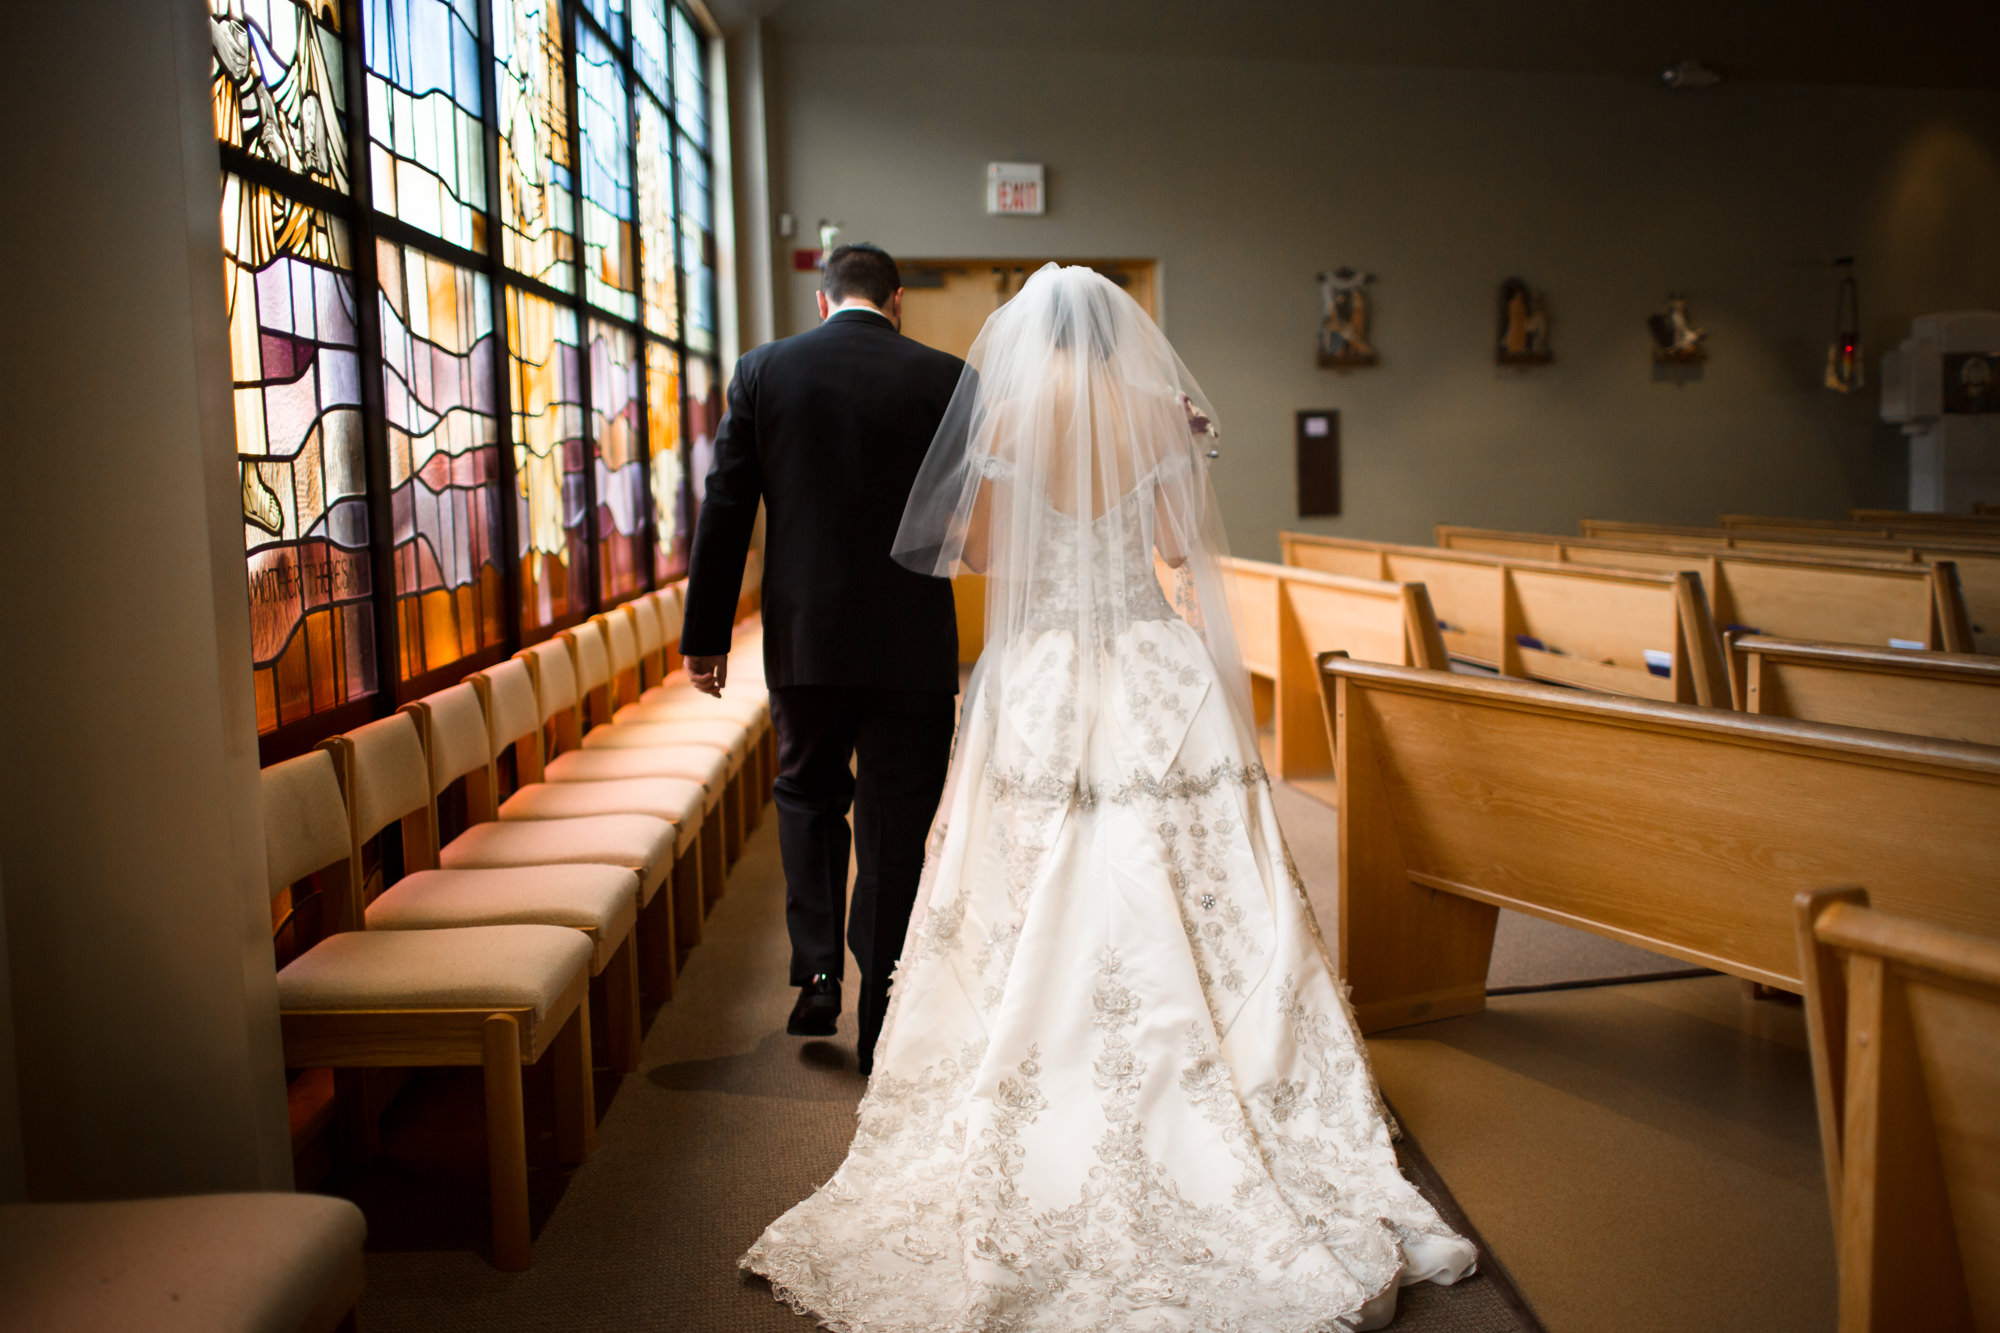 Benvenuto_Wedding_catholic_Florida_Bride-Groom-57.jpg